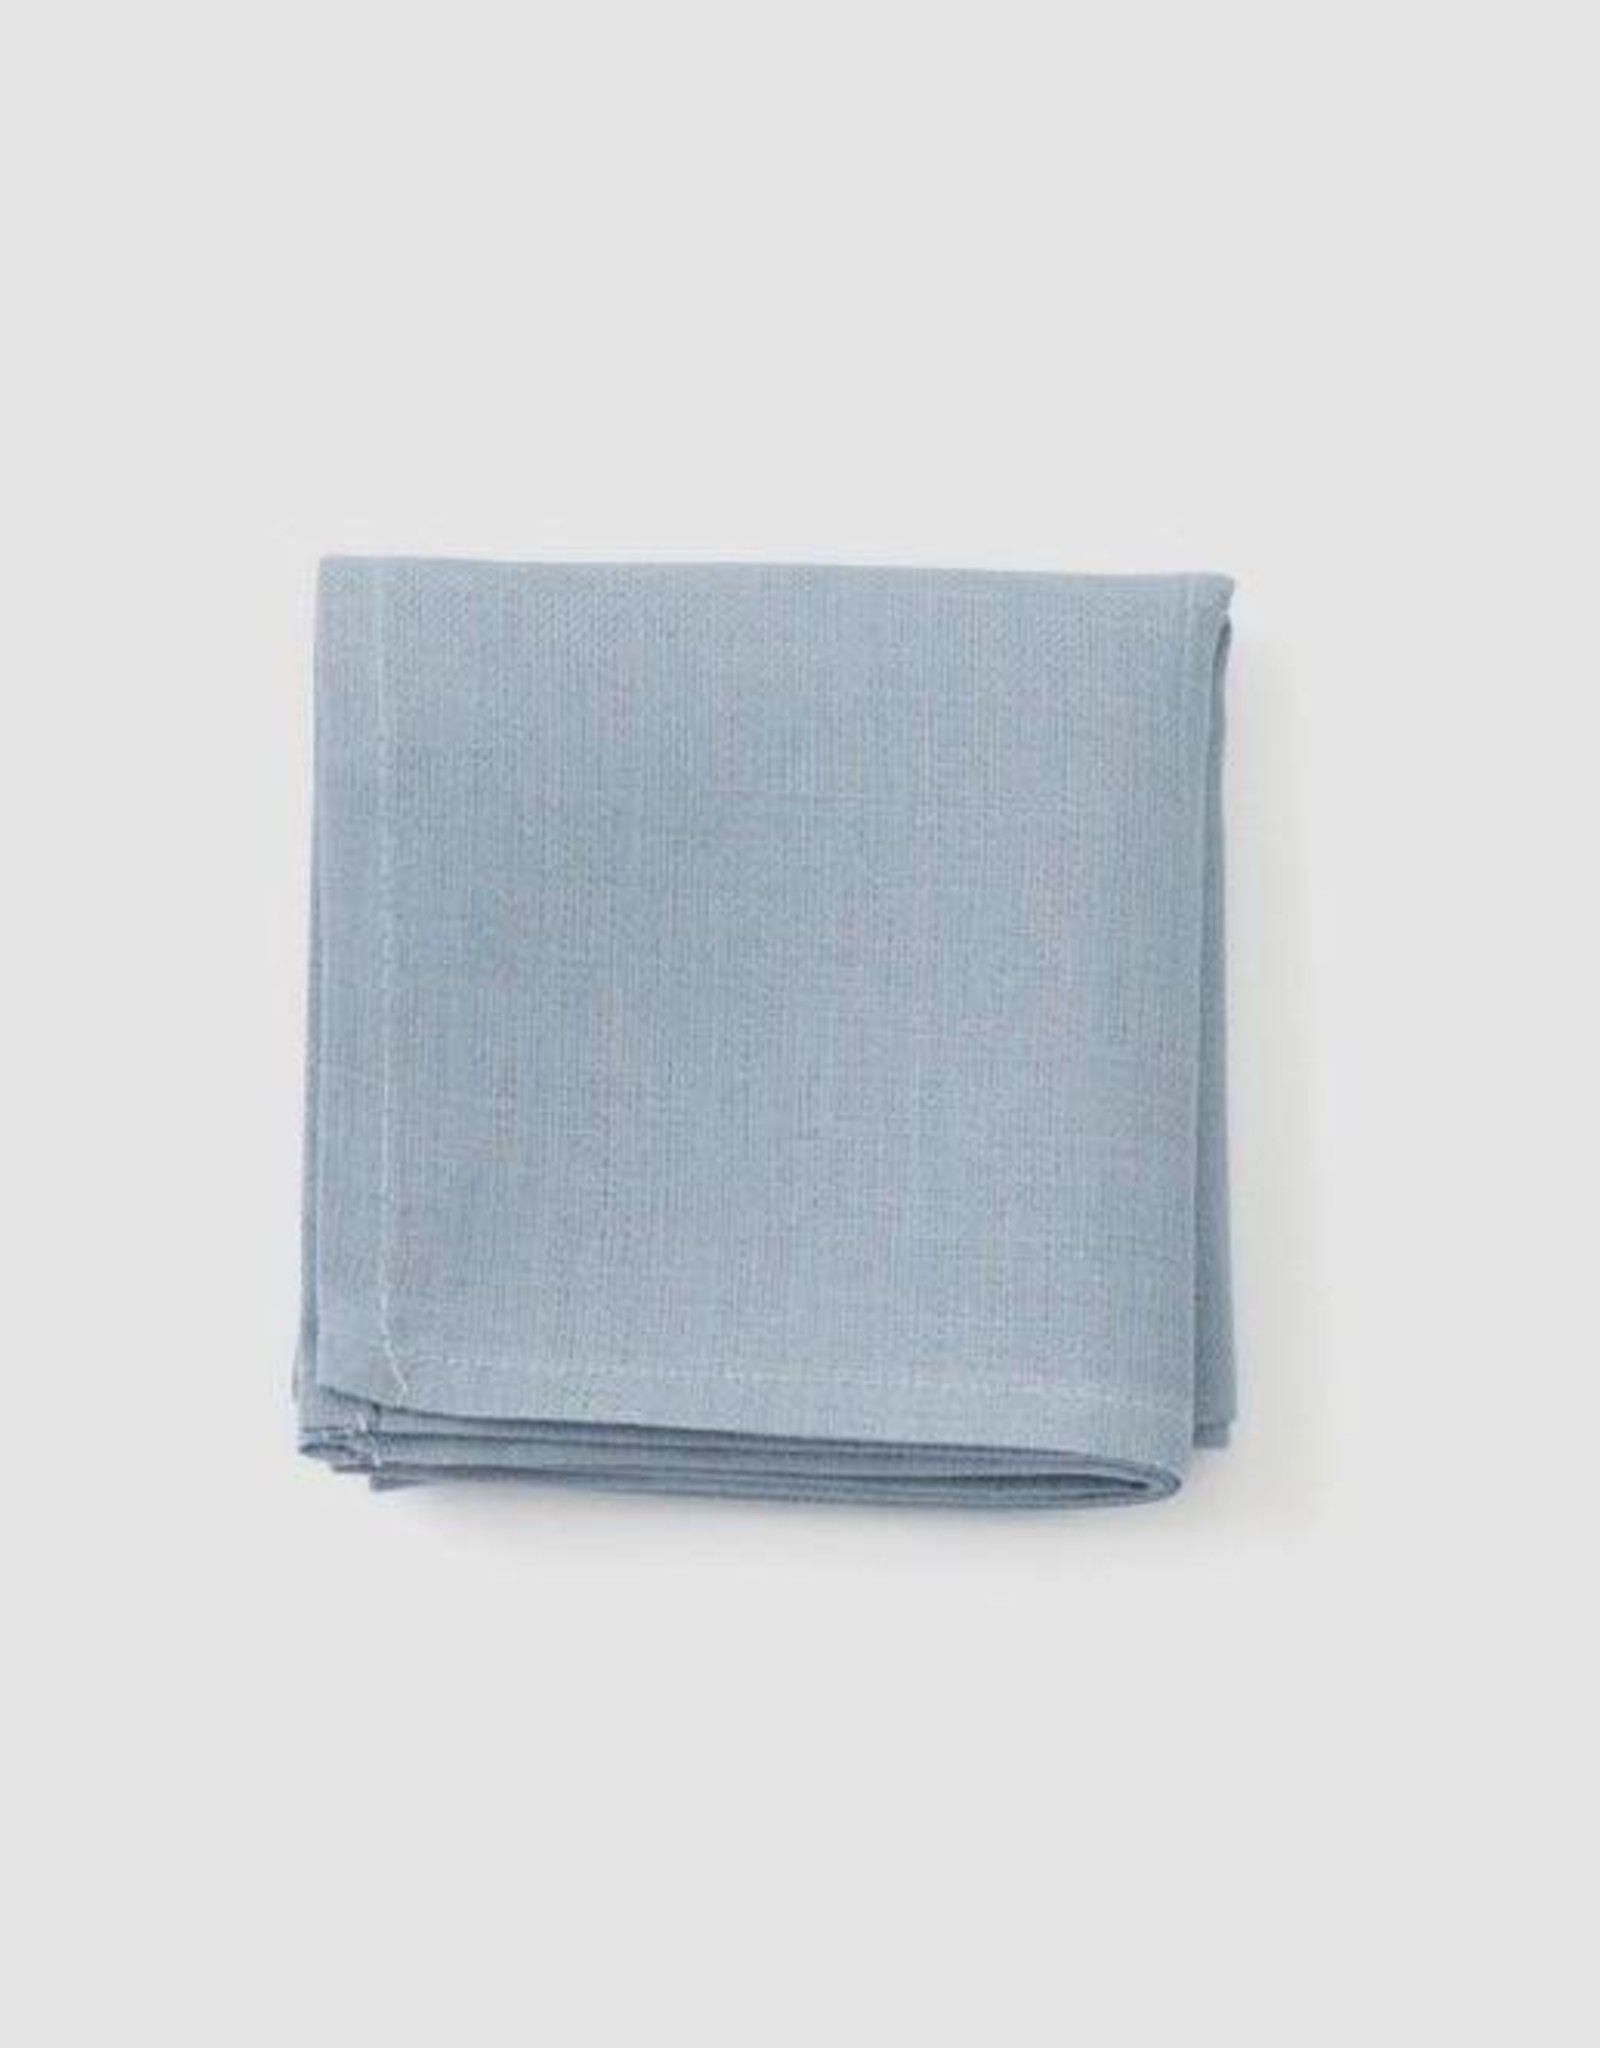 Fog Linen Handkerchief - Blue Grey